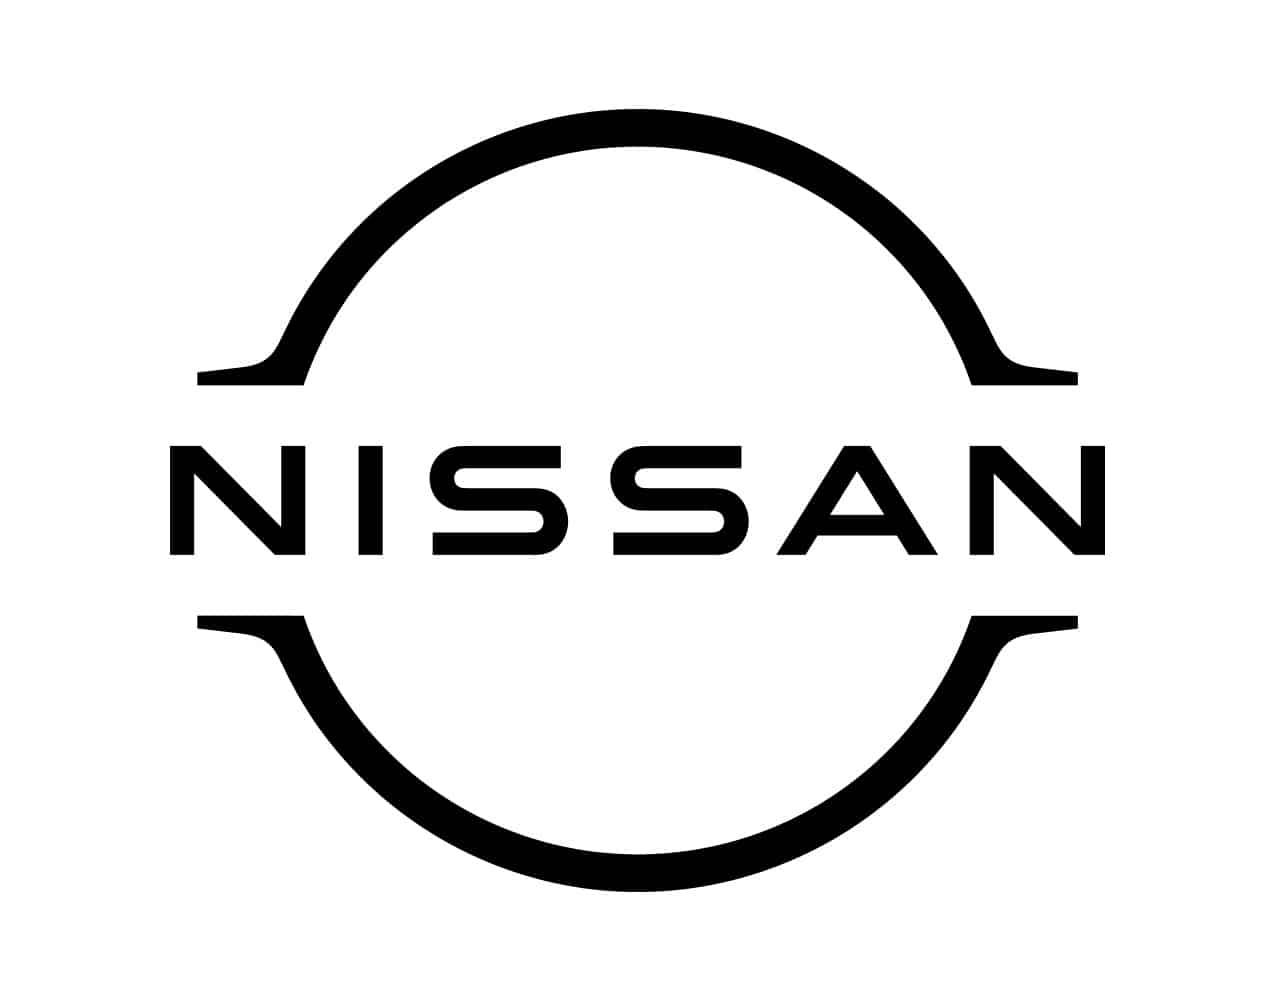 Nissan-Brand-Logo-source